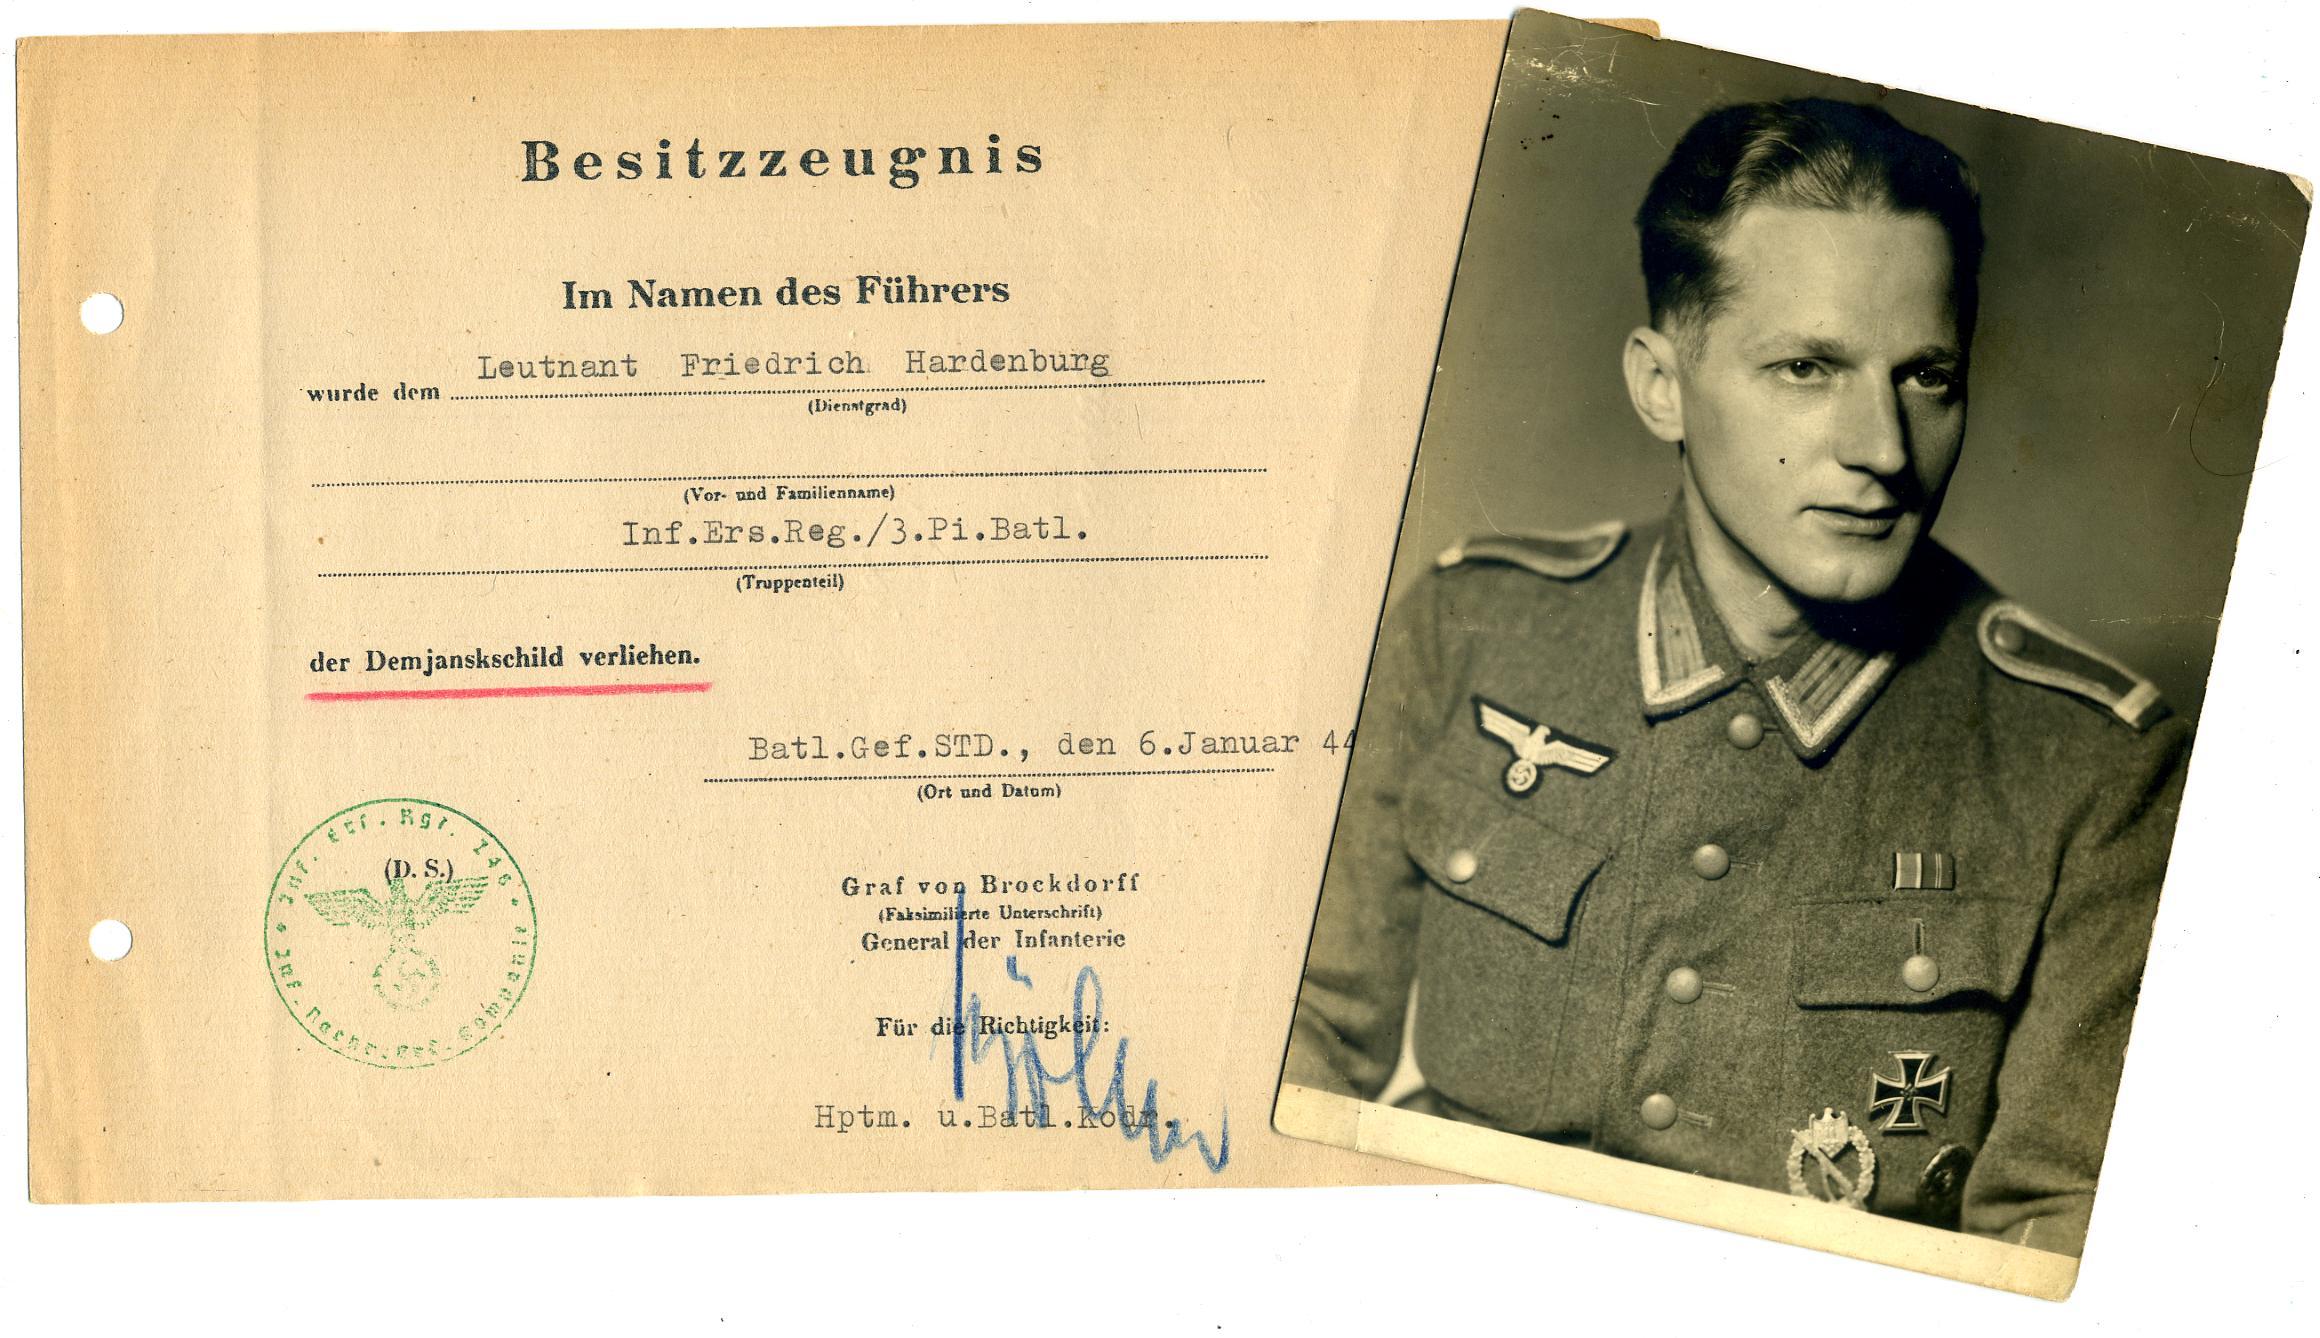 Demjansk award Document and Picture of Leutnant Friedrich Hardenberg.